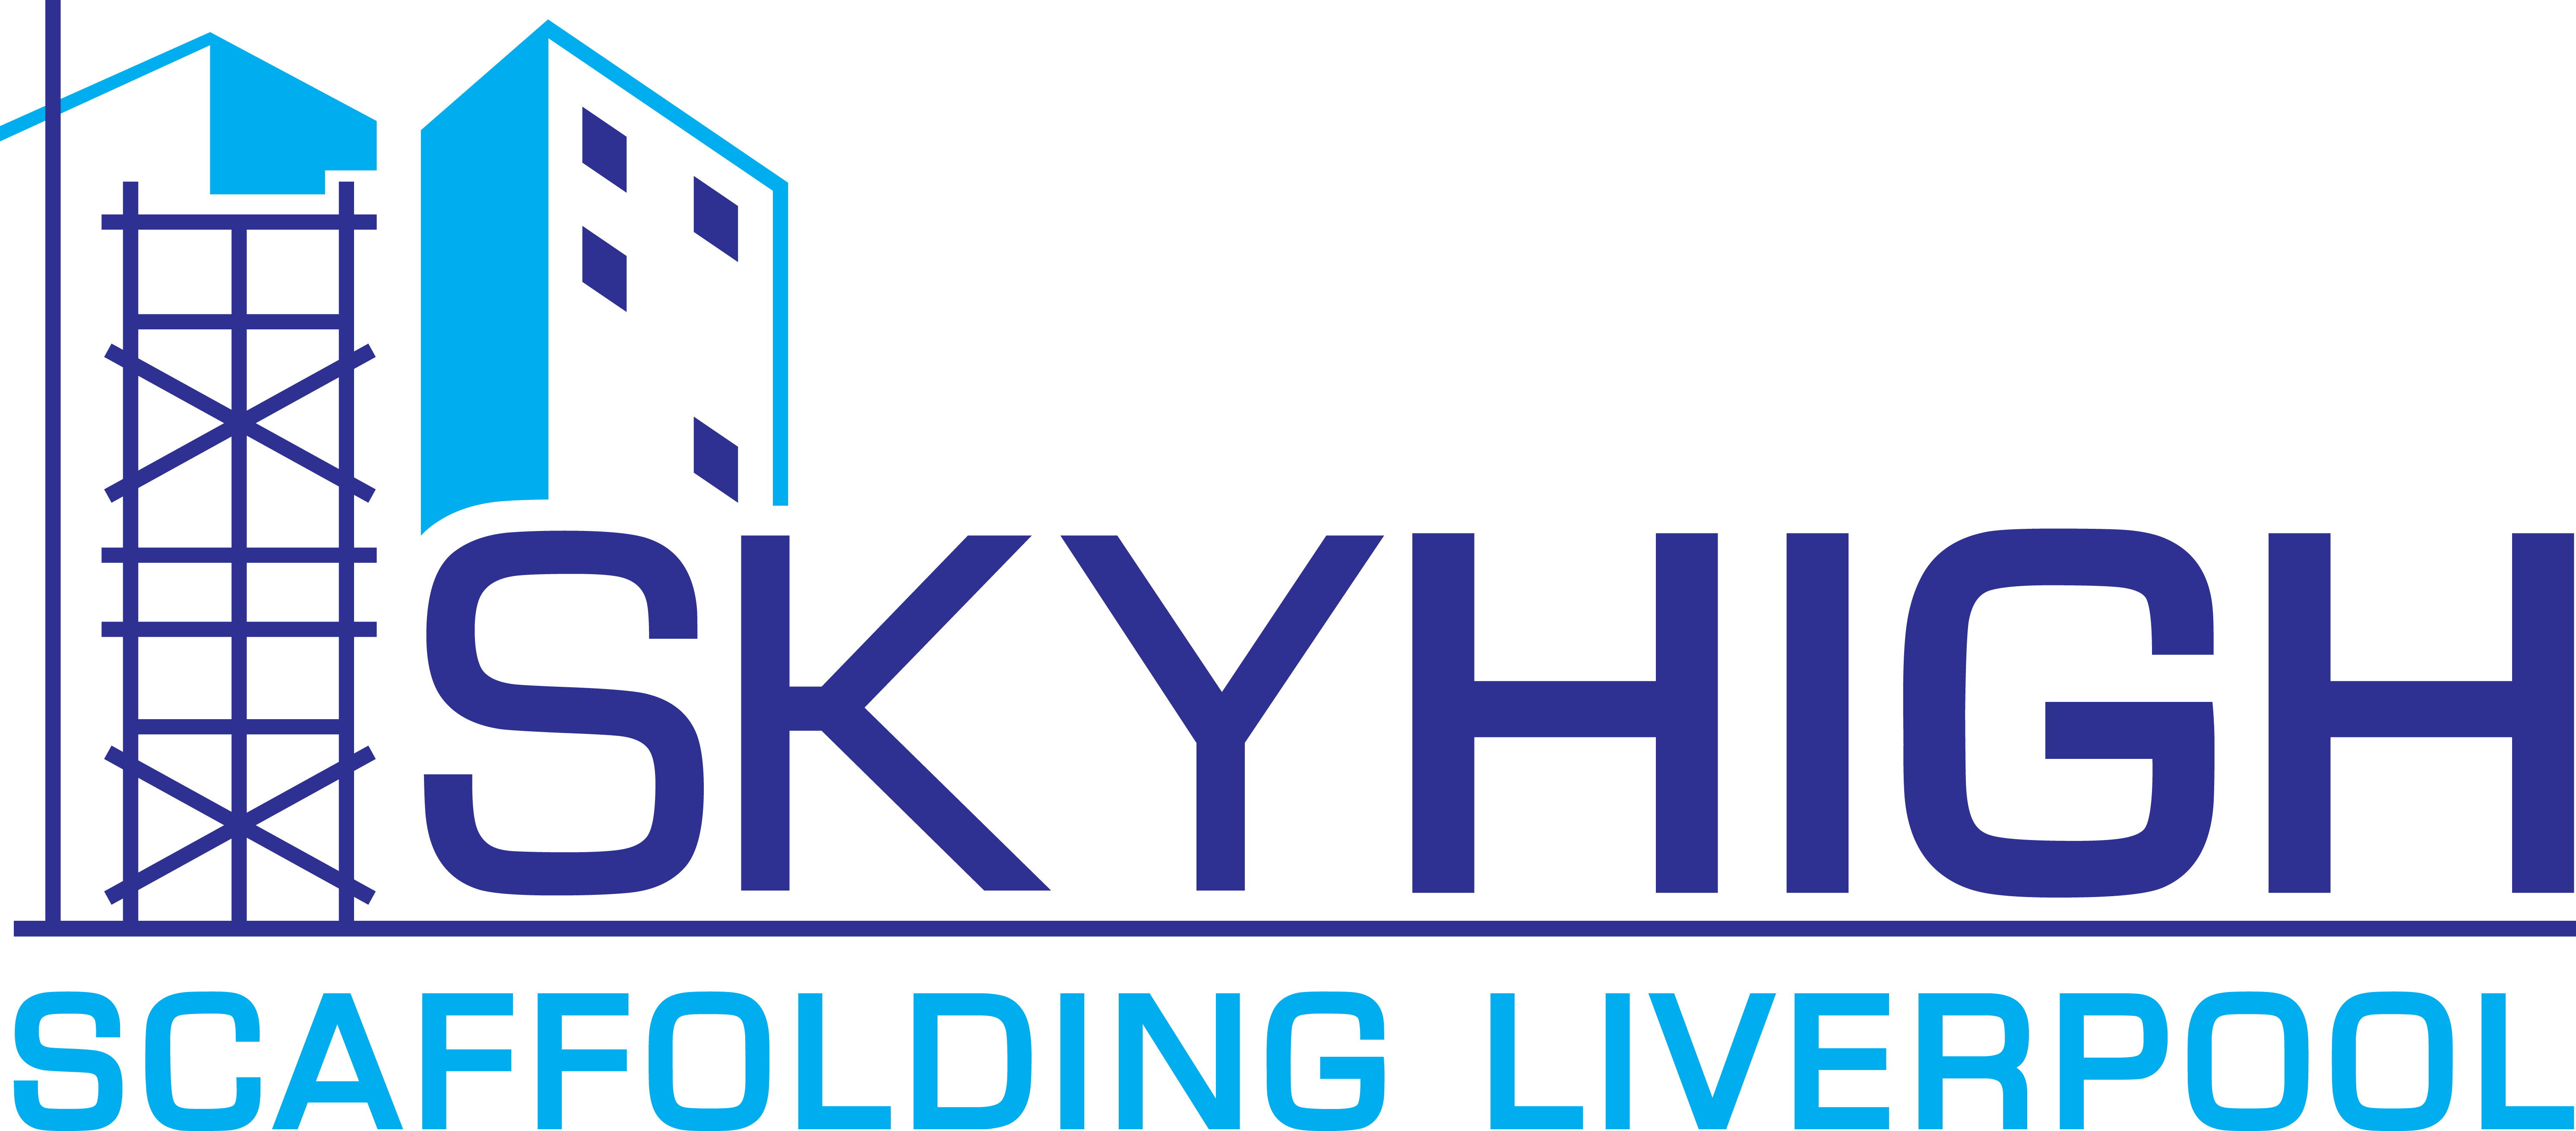 Skyhigh Scaffolding Liverpool